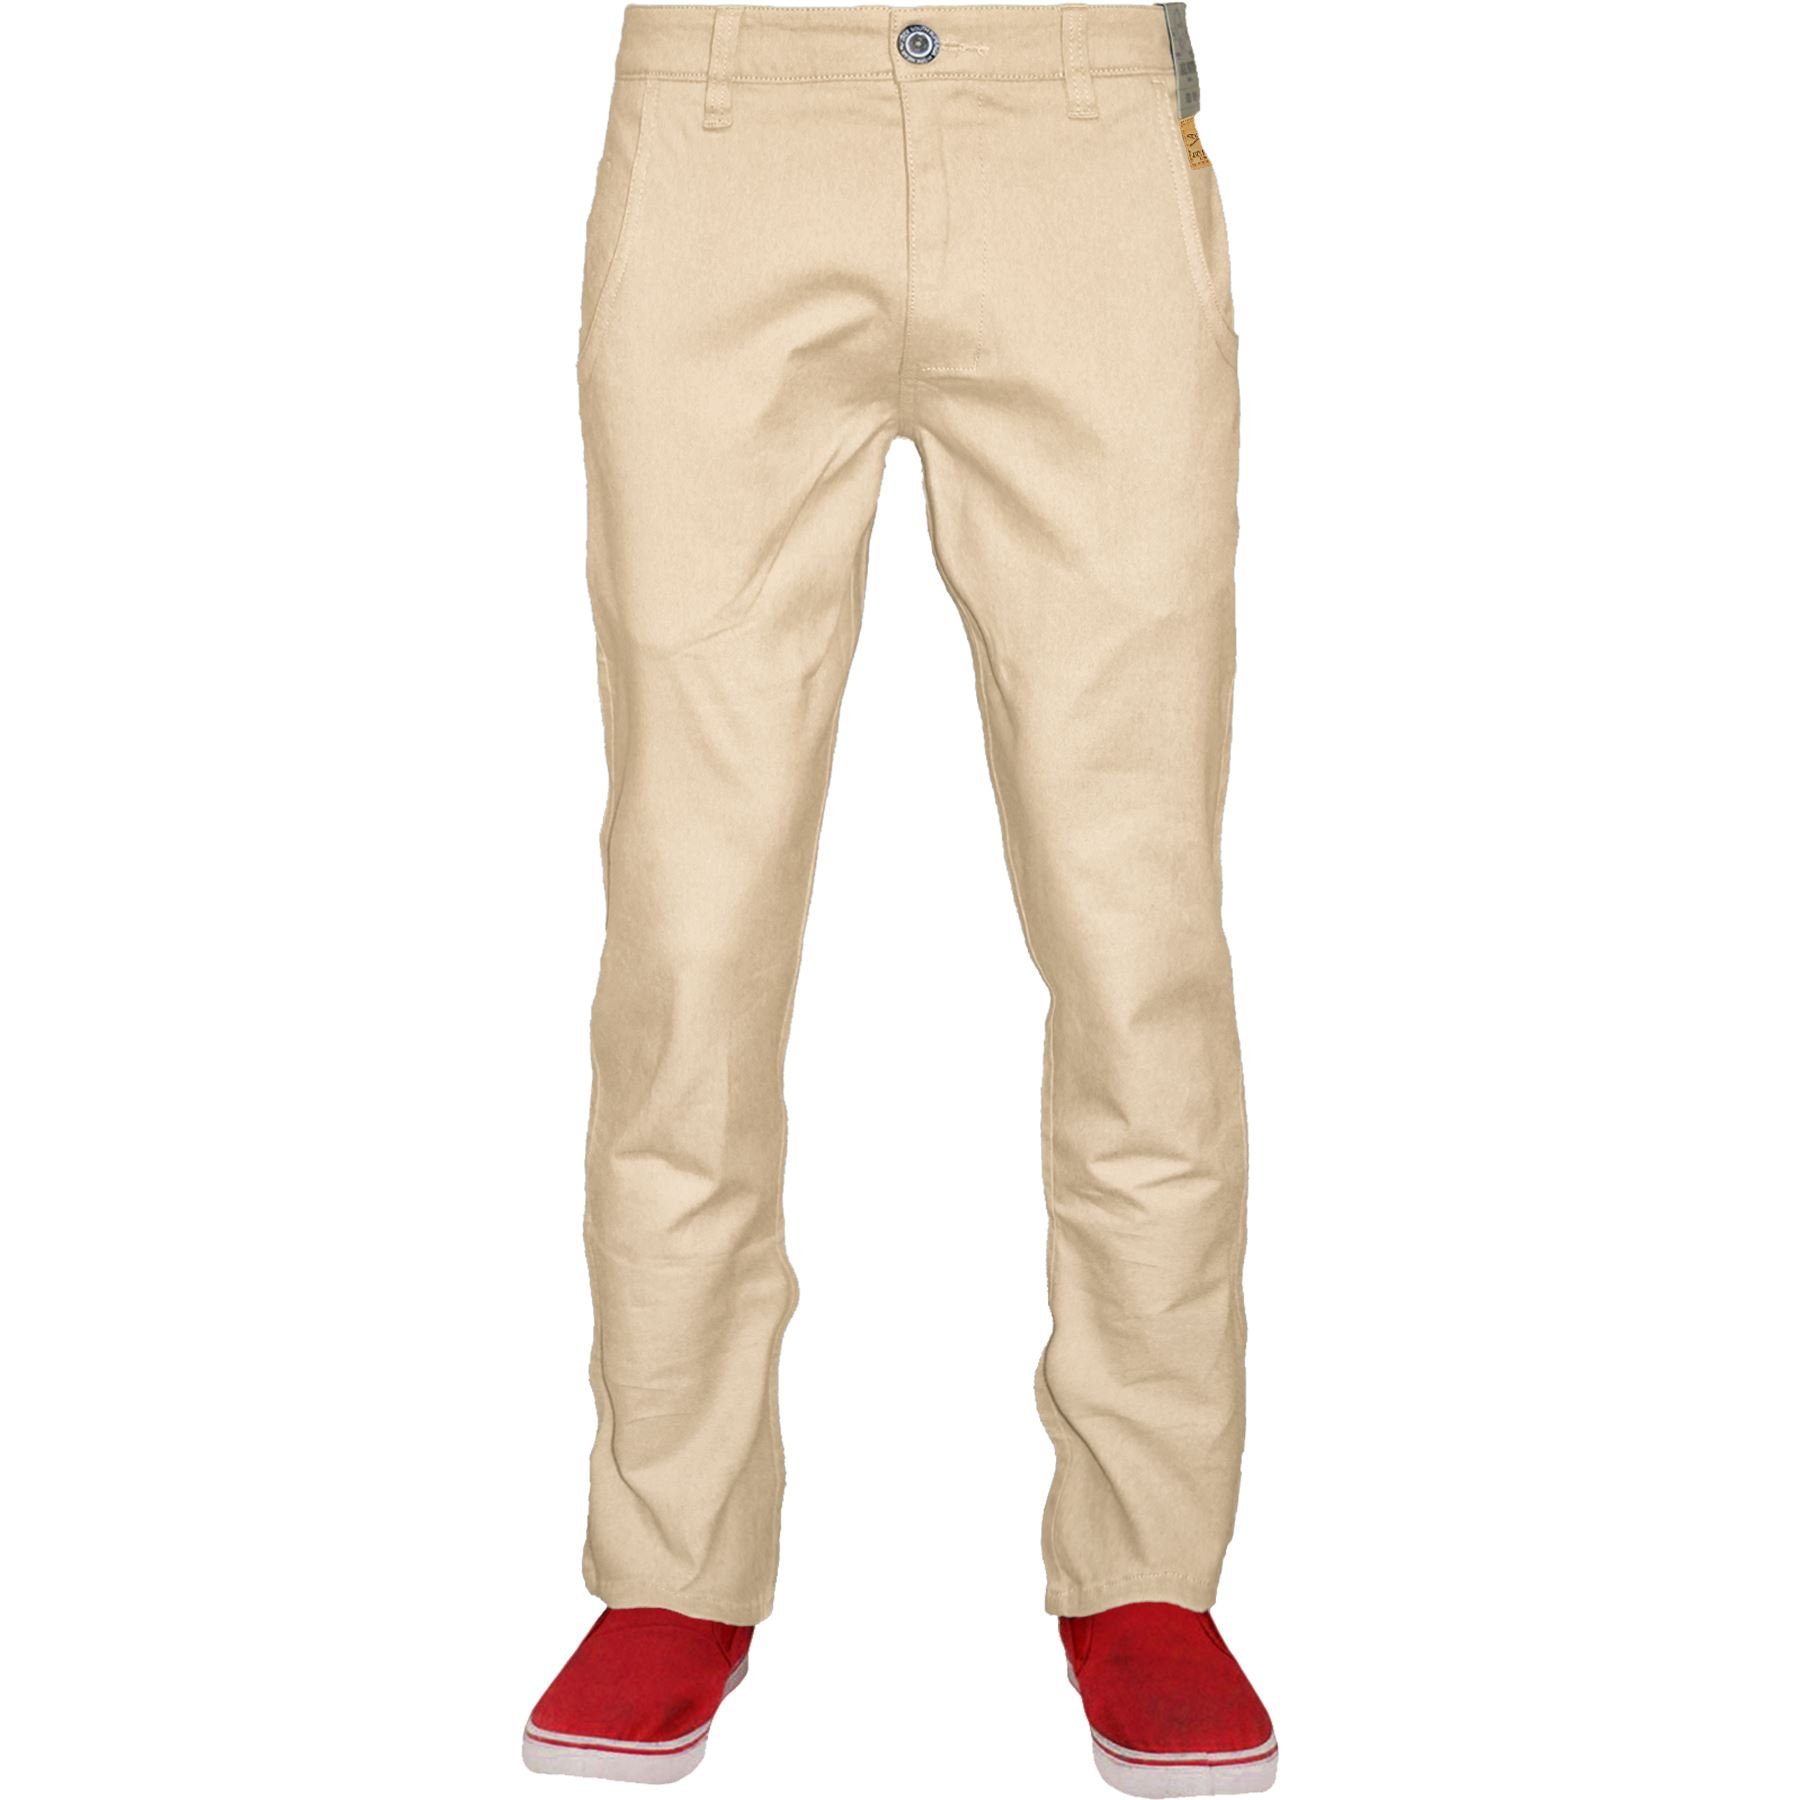 New-Mens-Chino-Trousers-100-Cotton-Pant-Straight-Leg-Slim-Fit-Jeans-Bottom thumbnail 20